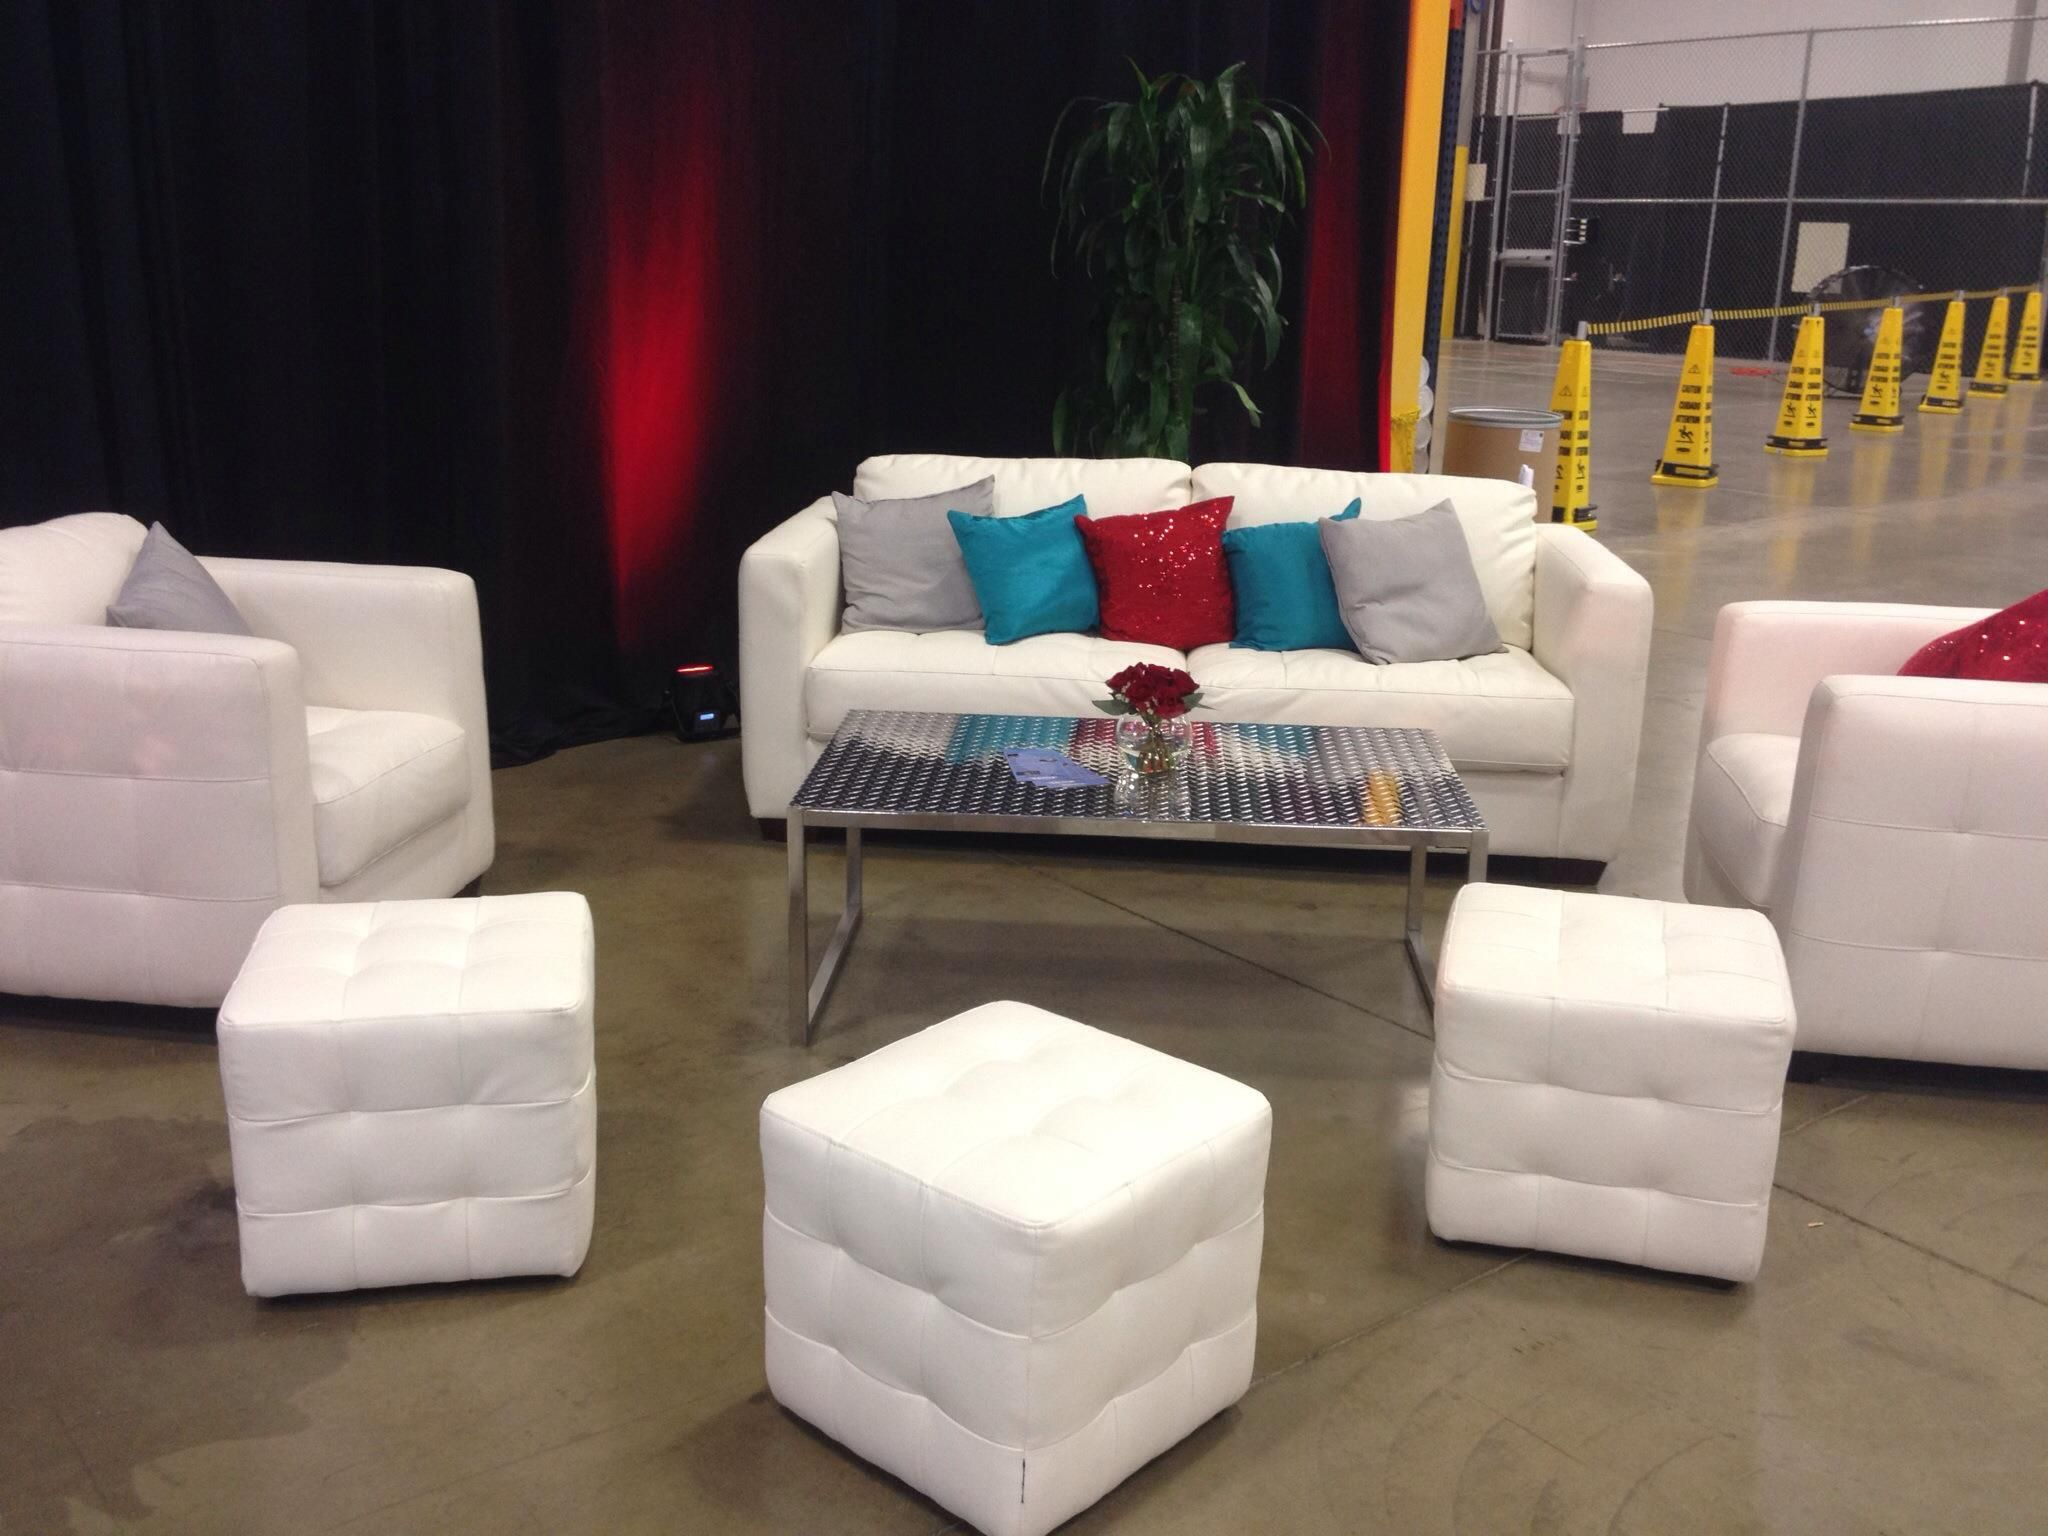 Sleek And Modern Event Furniture From Modern Event Rental Rental Furniture Furniture Lounge Furniture